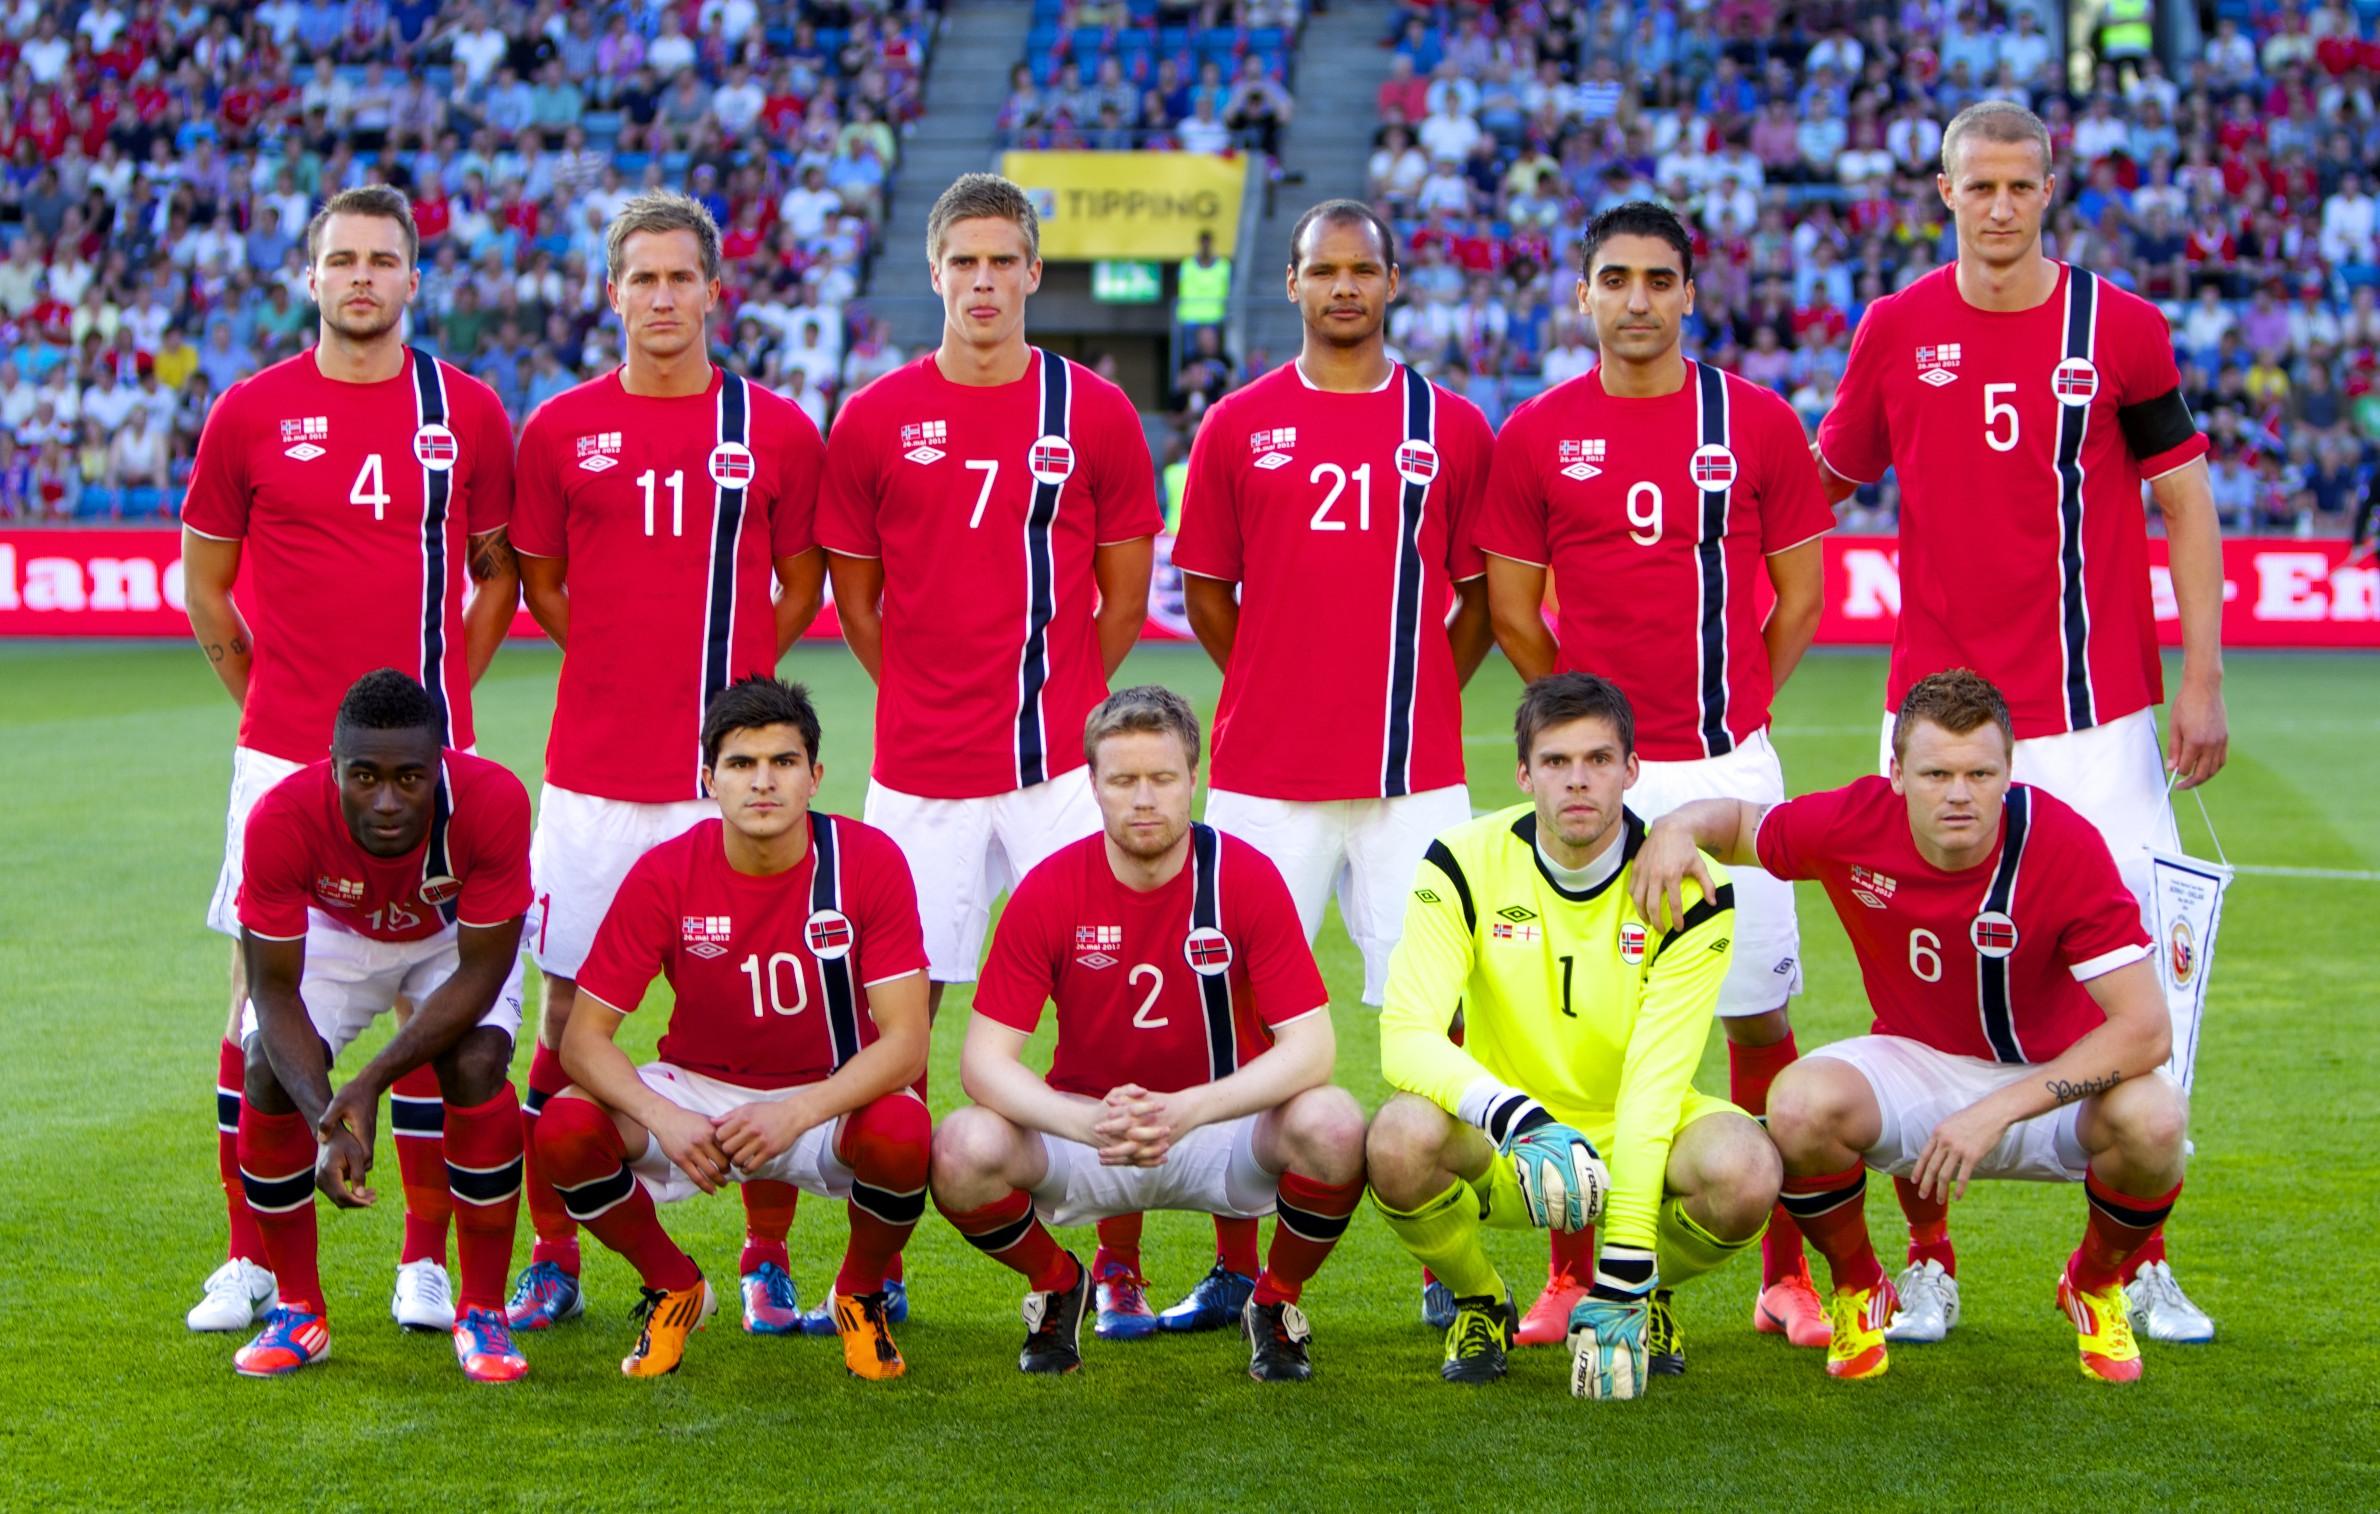 Norges herrlandslag i fotboll - Wikiwand 60c7ada10a5d0